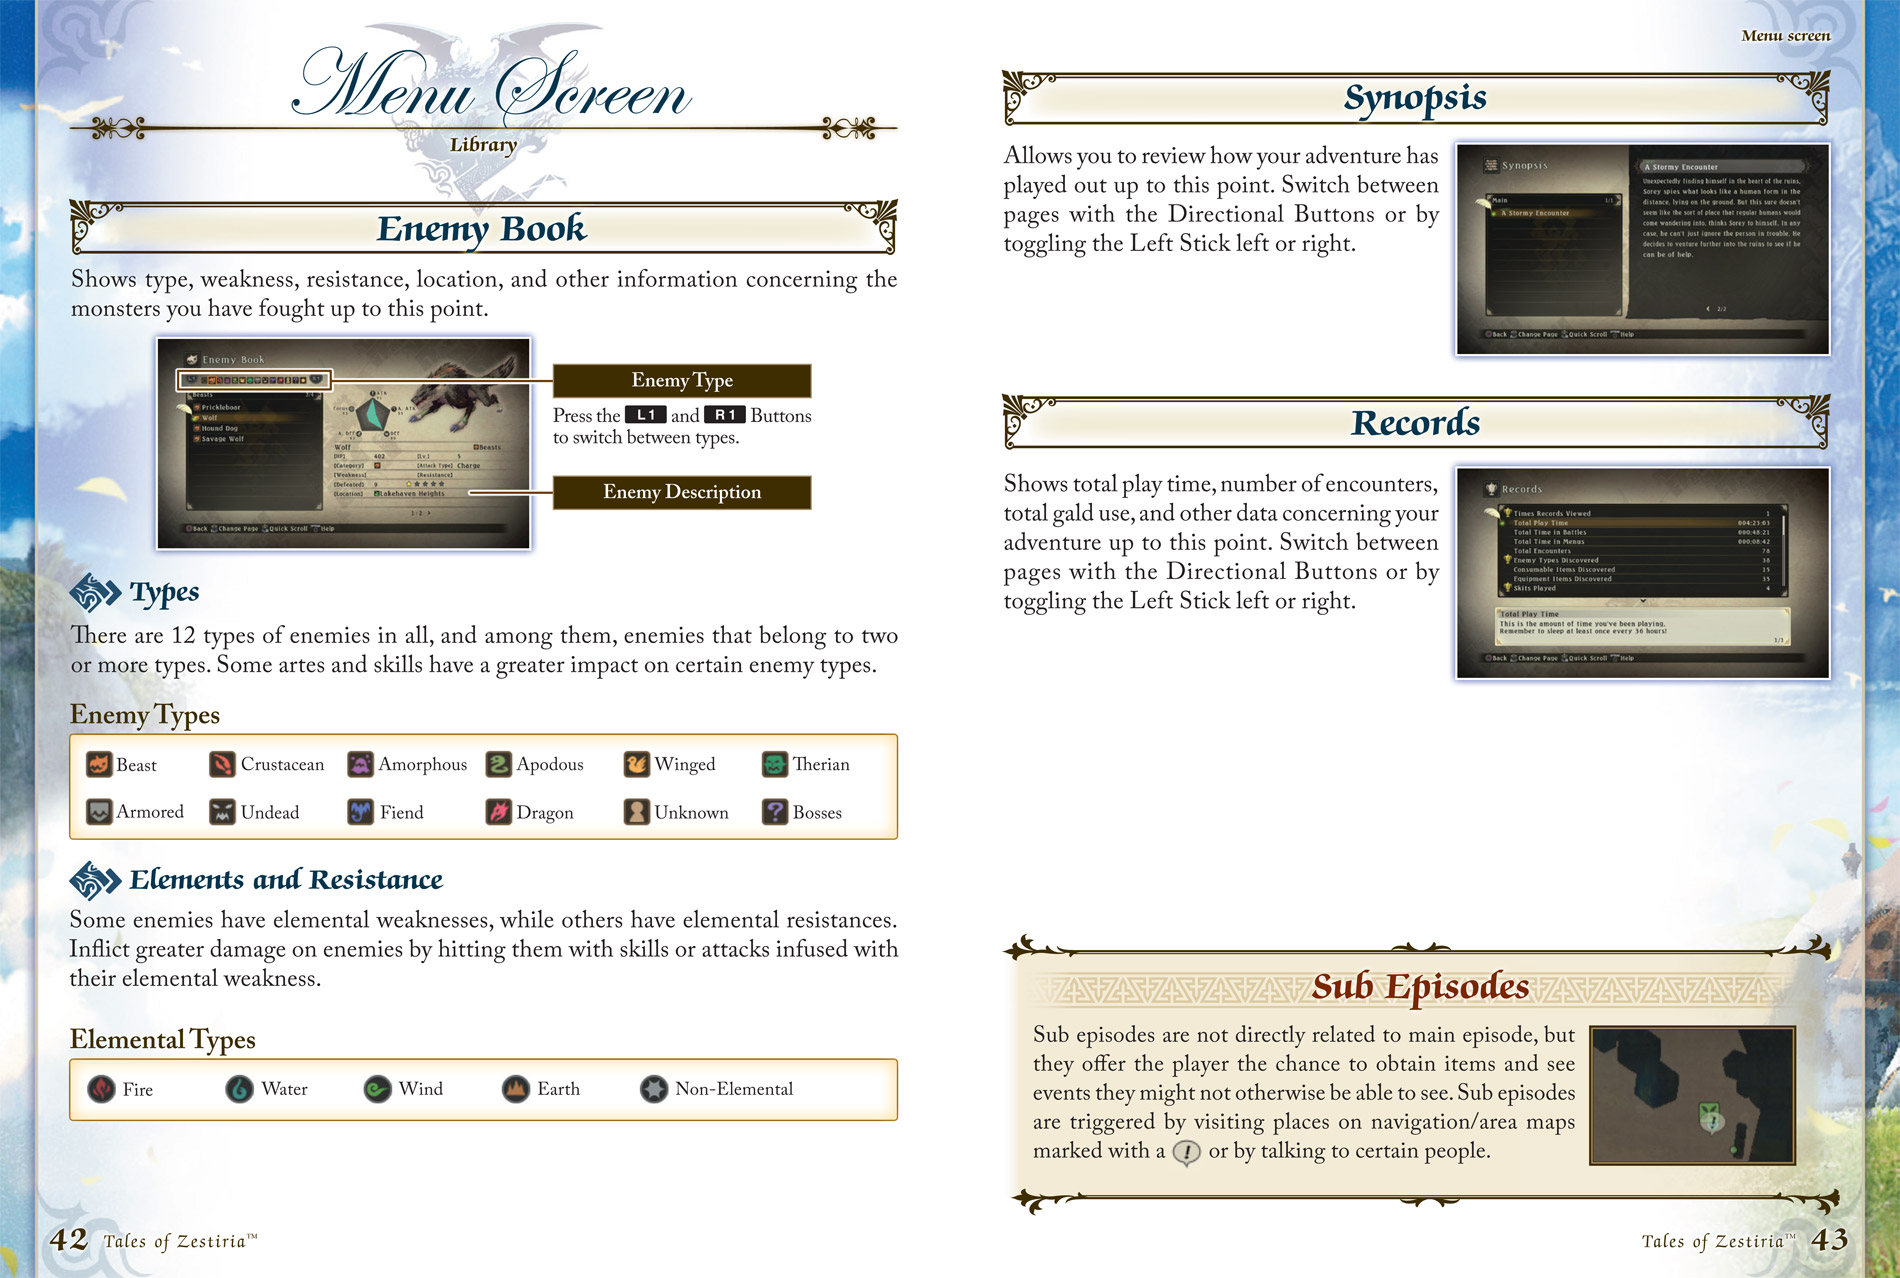 e manuals online review